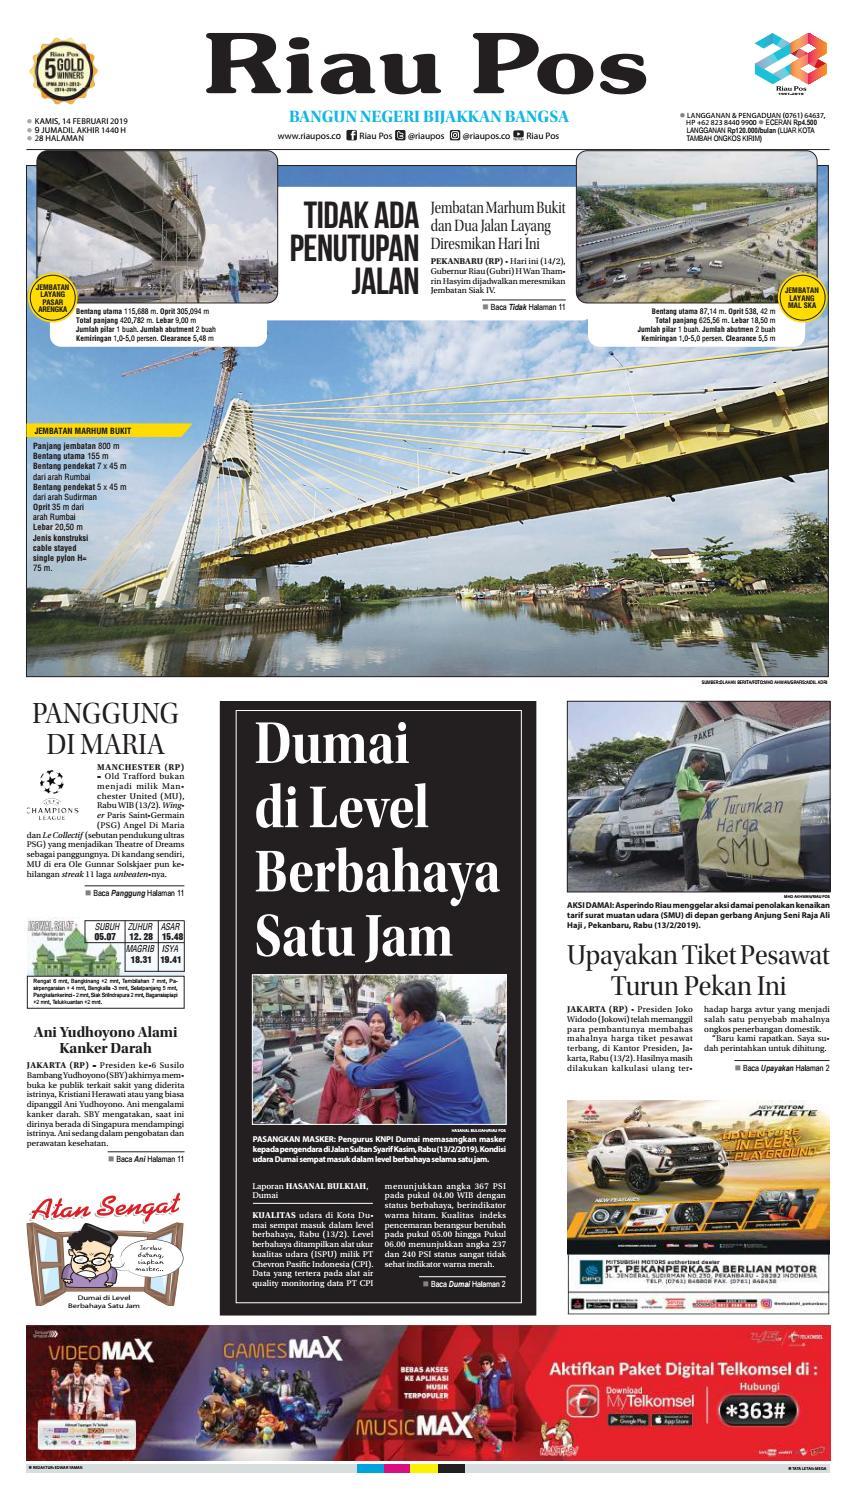 Riaupos Edisi Kamis 14 Februari 2014 By Riau Pos Issuu